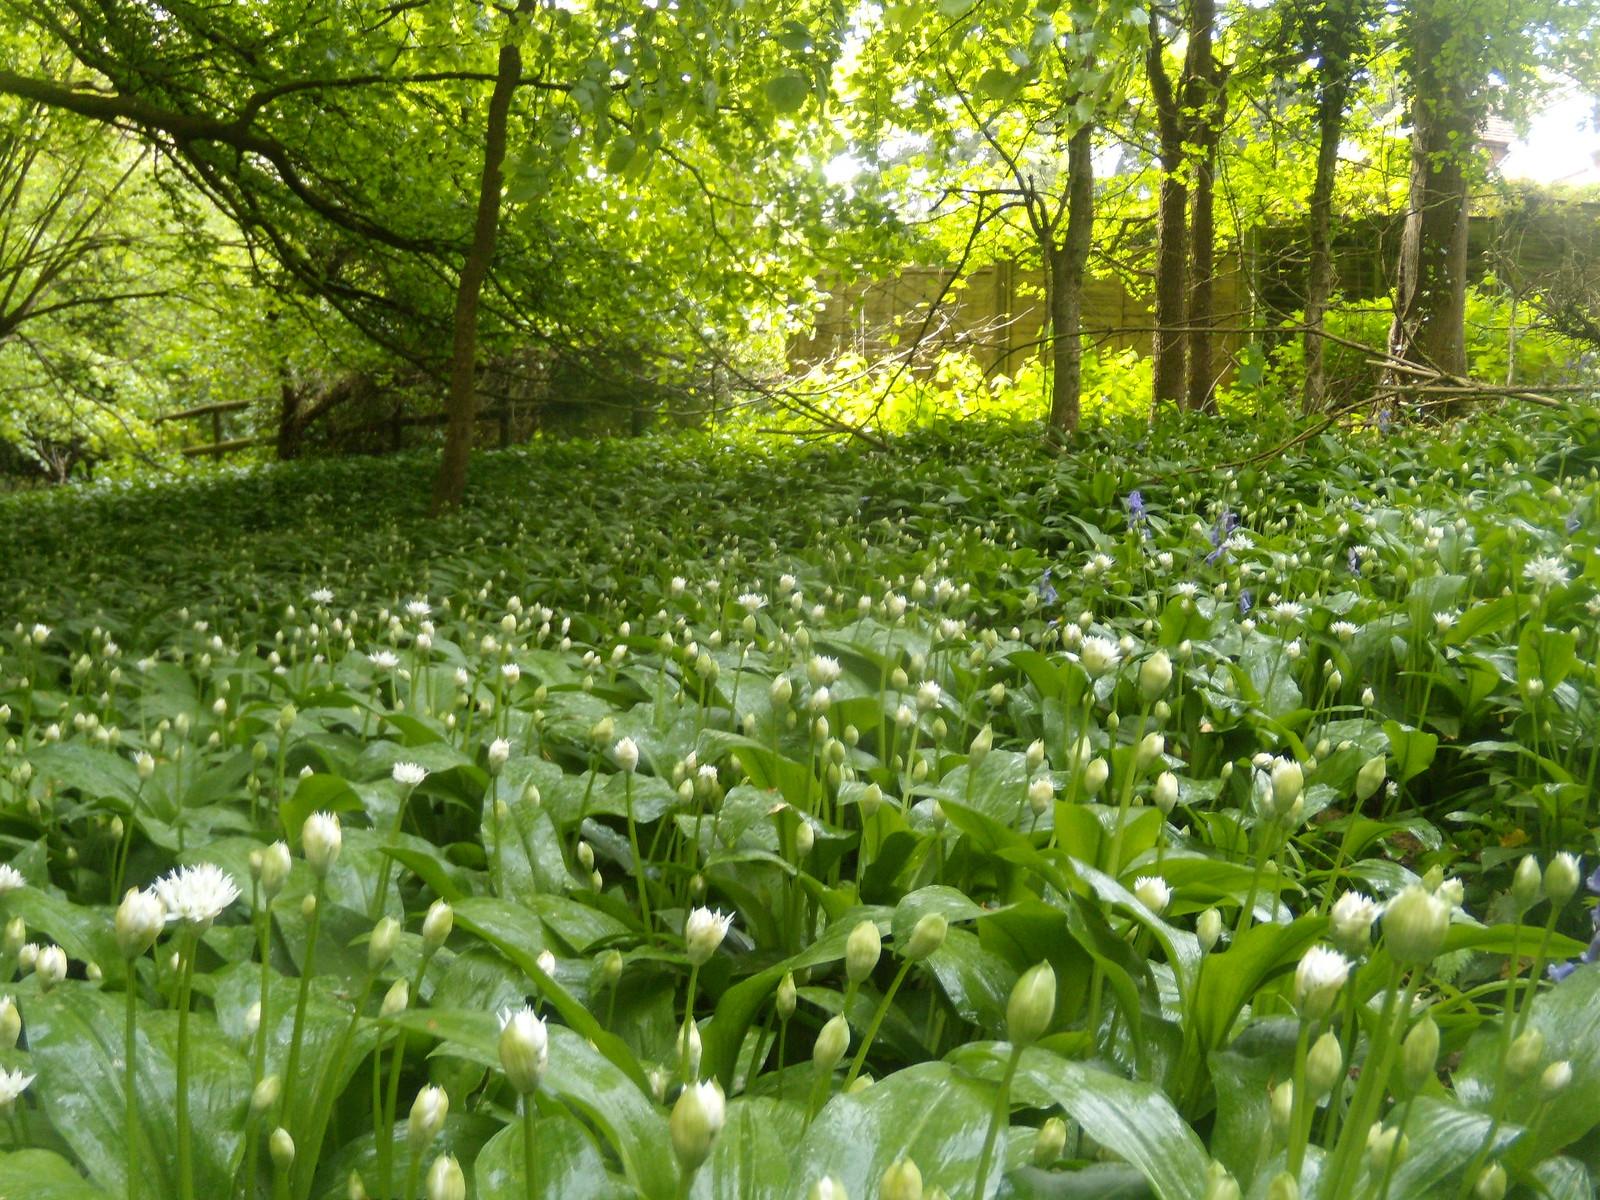 Wild Garlic Closed due to rain. But still pretty. Henley Circular via Stonor